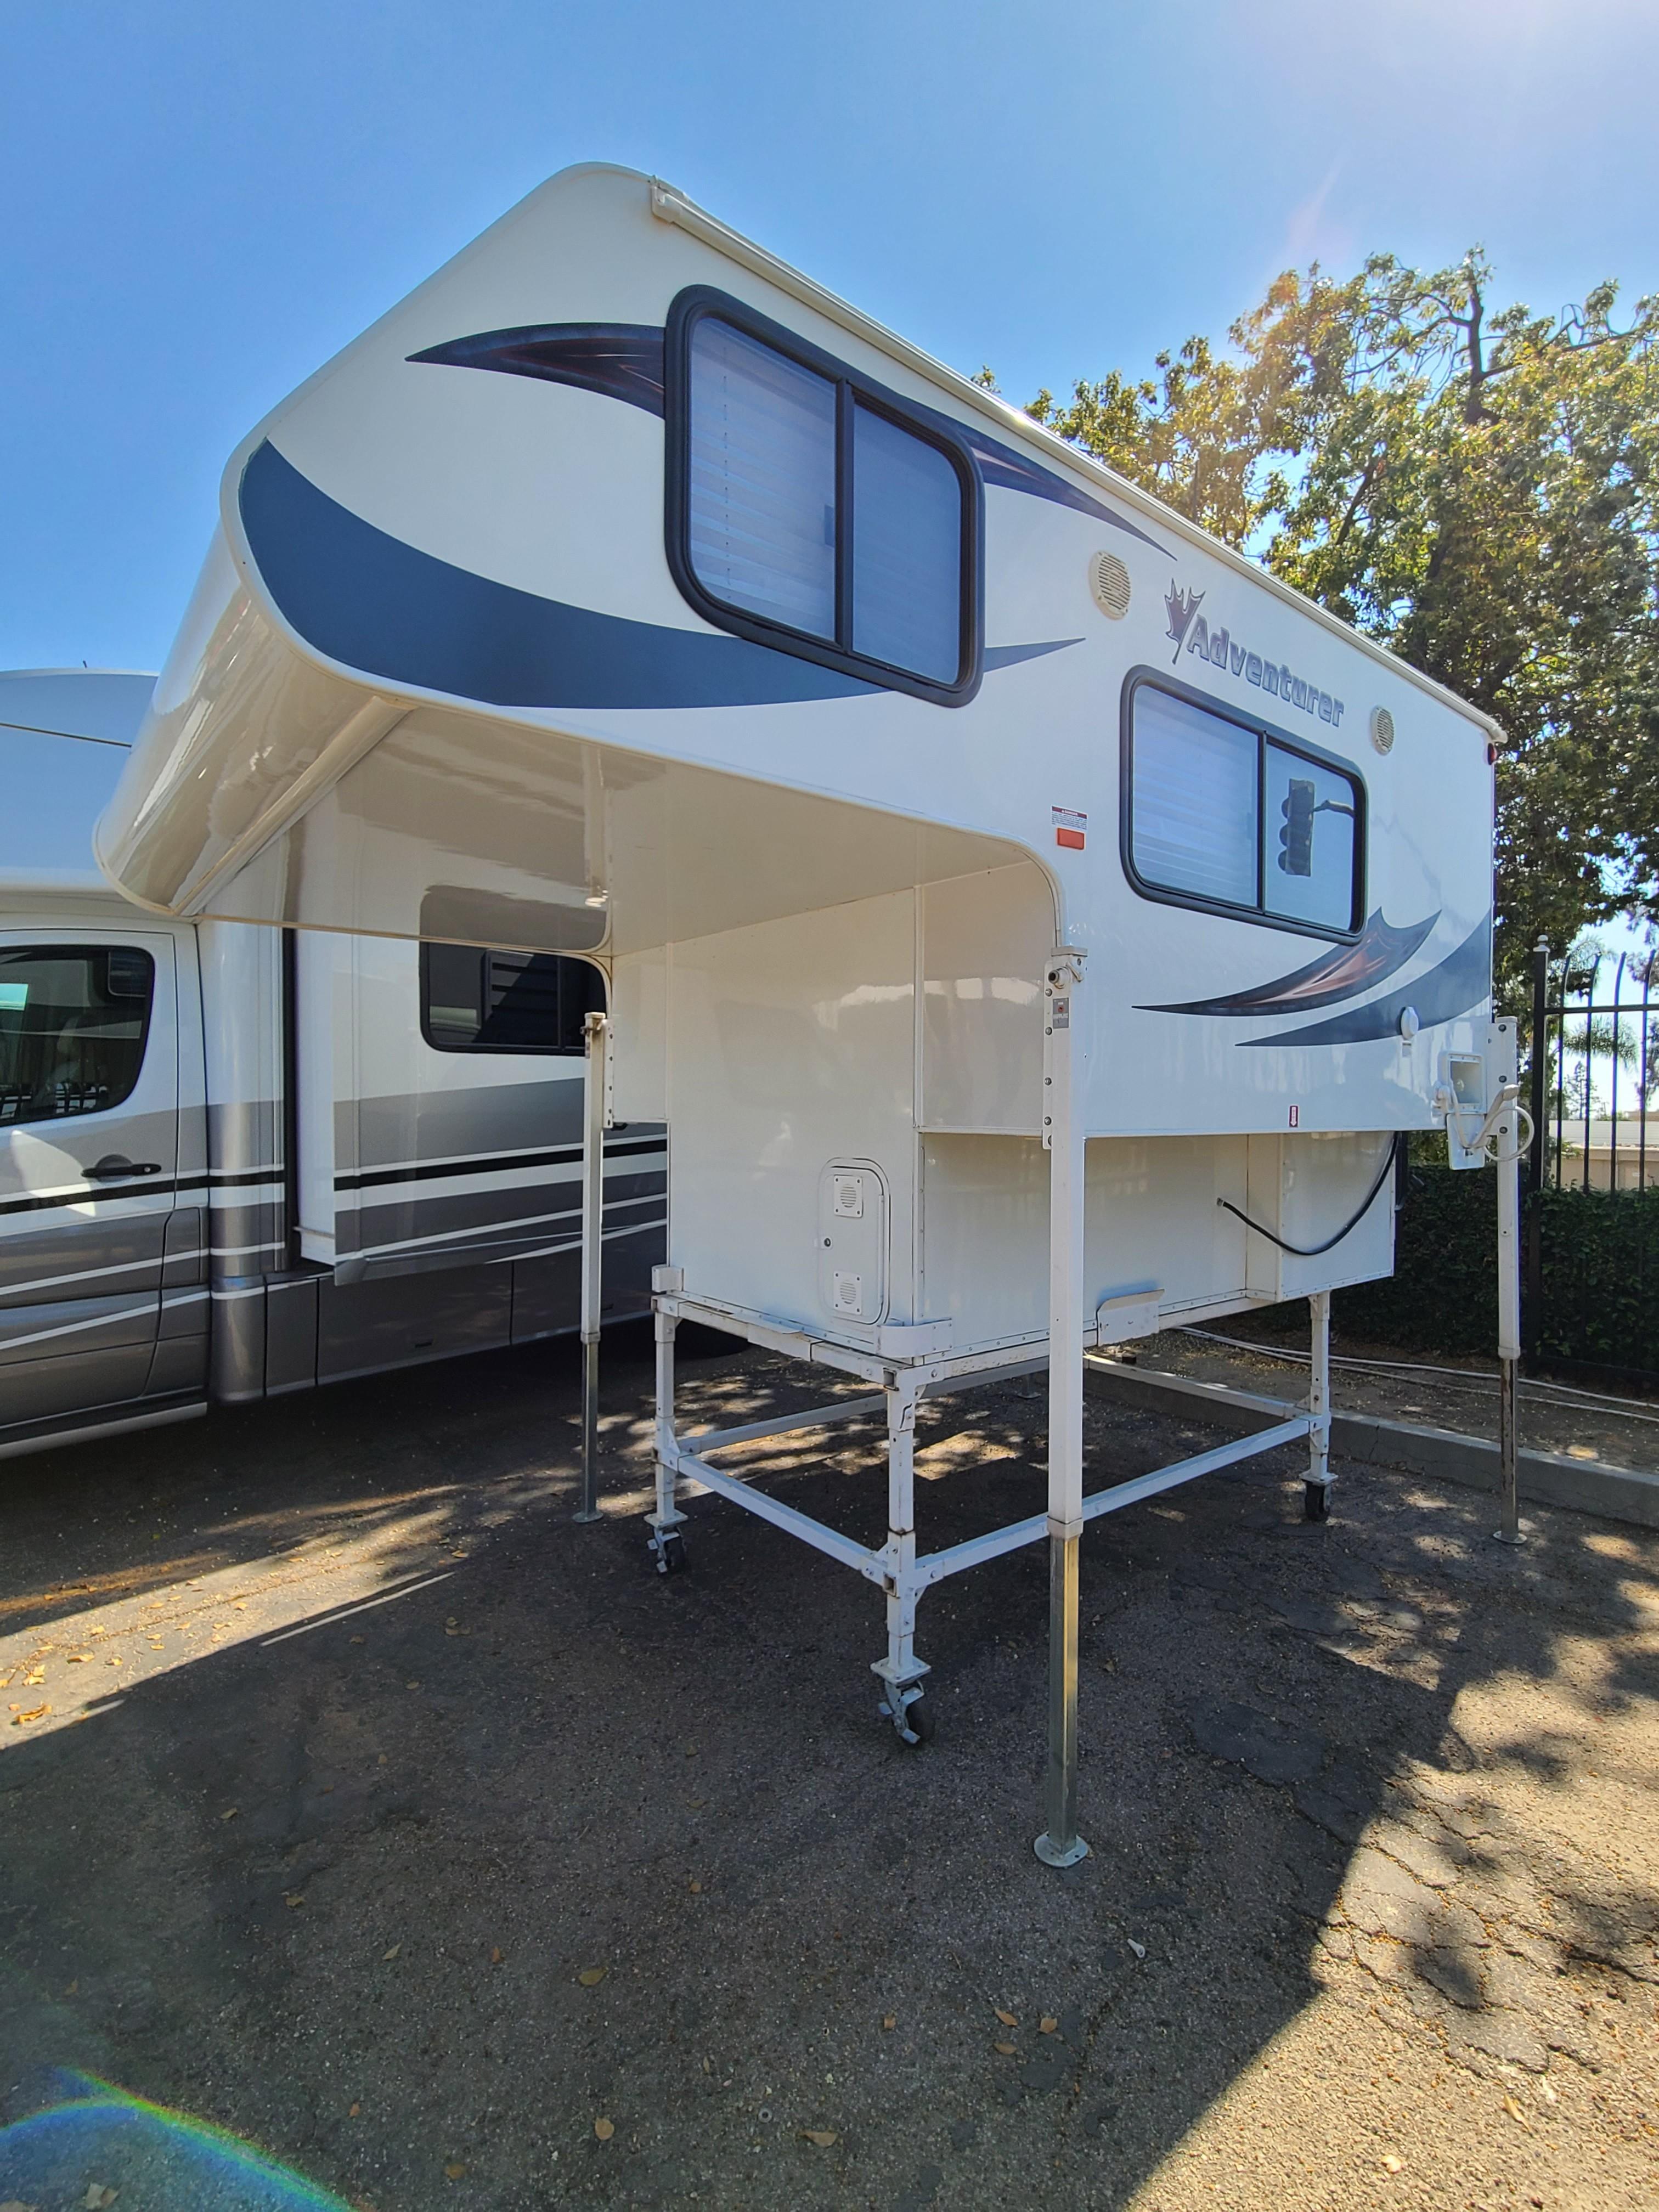 Used, 2017, Adventurer Mfg, 80GS, Truck Campers